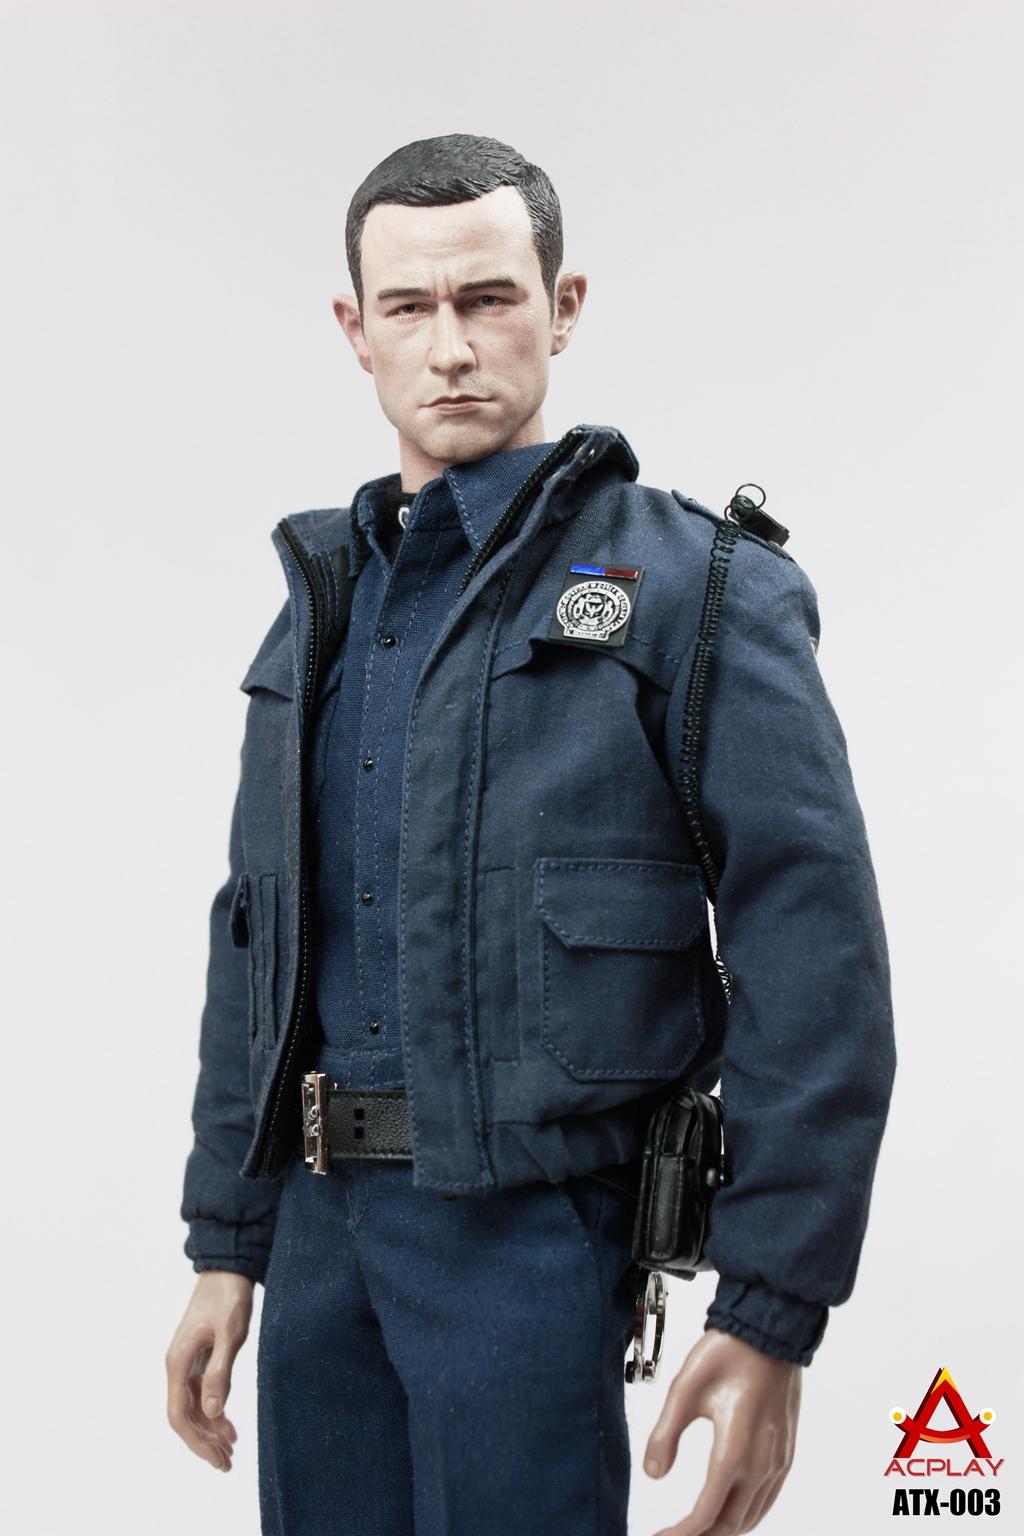 ACPLAY ATX003 1:6 Batman Gotham City Police Officer Robin Clothes Set for Action Figure DIY(China (Mainland))